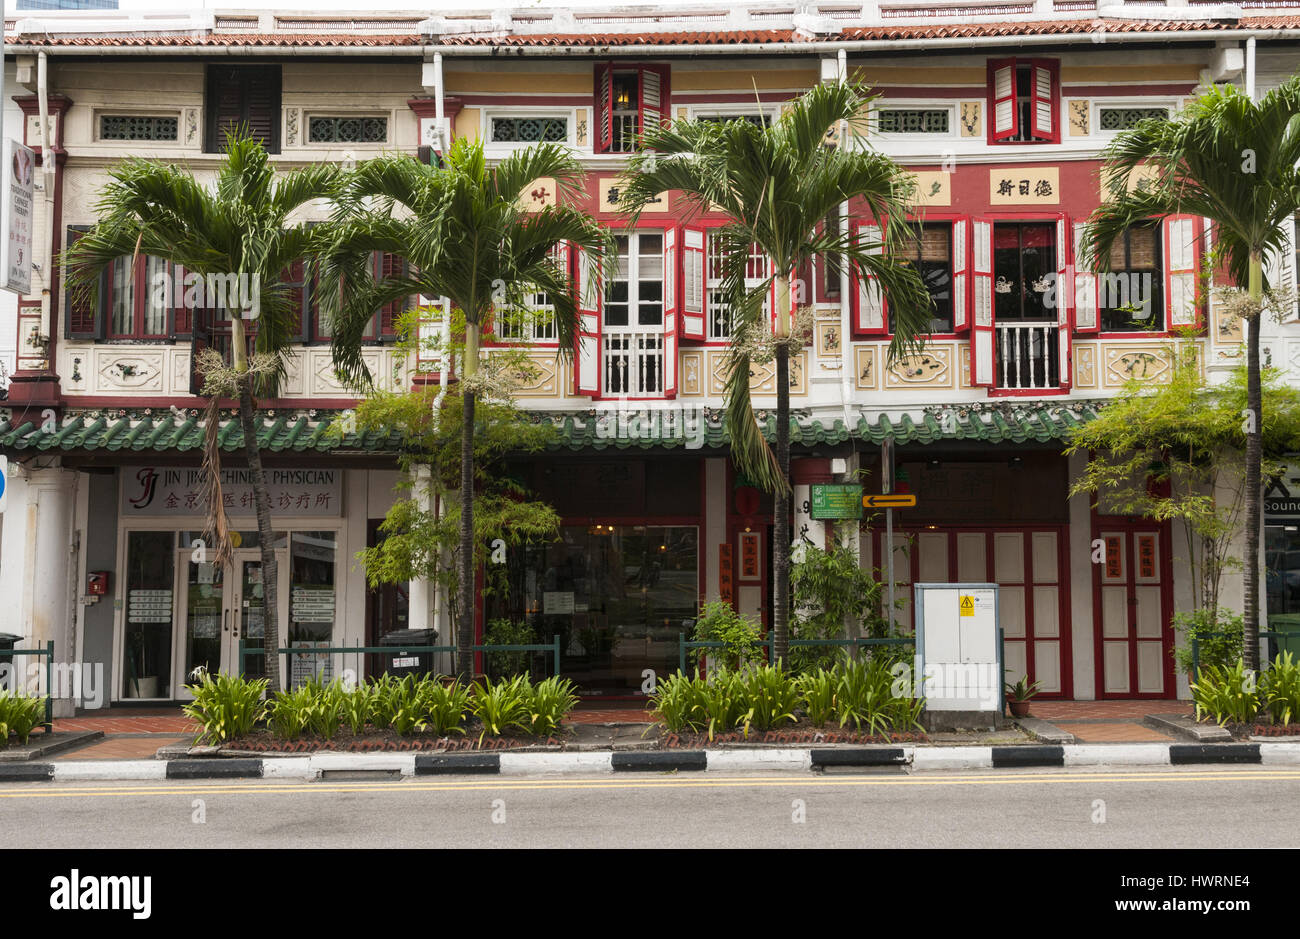 Singapore, Chinatown, Chinese shophouses - Stock Image